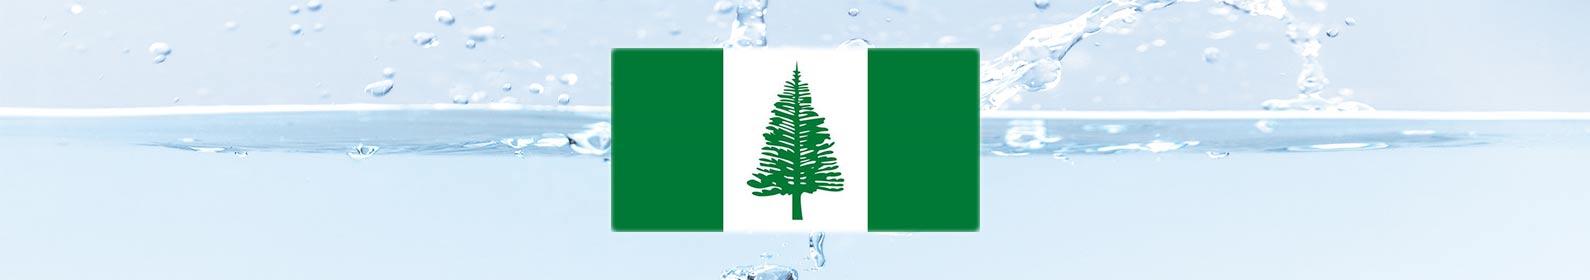 water-treatment-norfolk-island.jpg